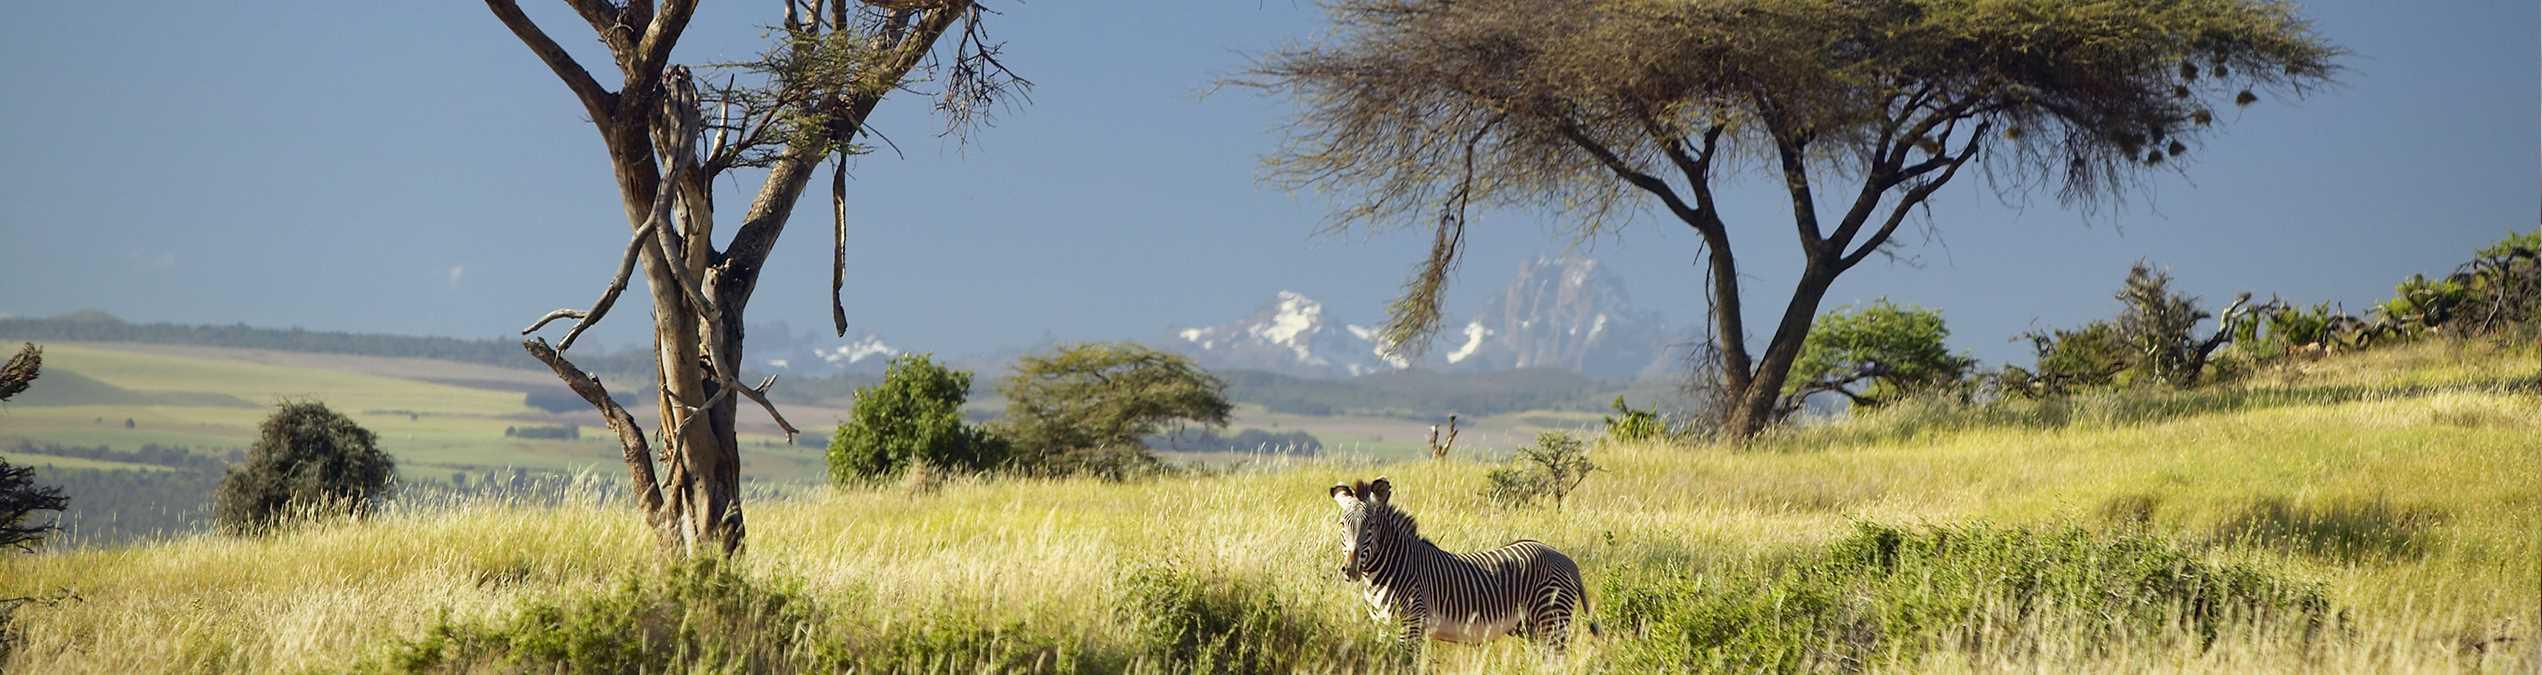 Safari Club - Kenya_Lewa Downs